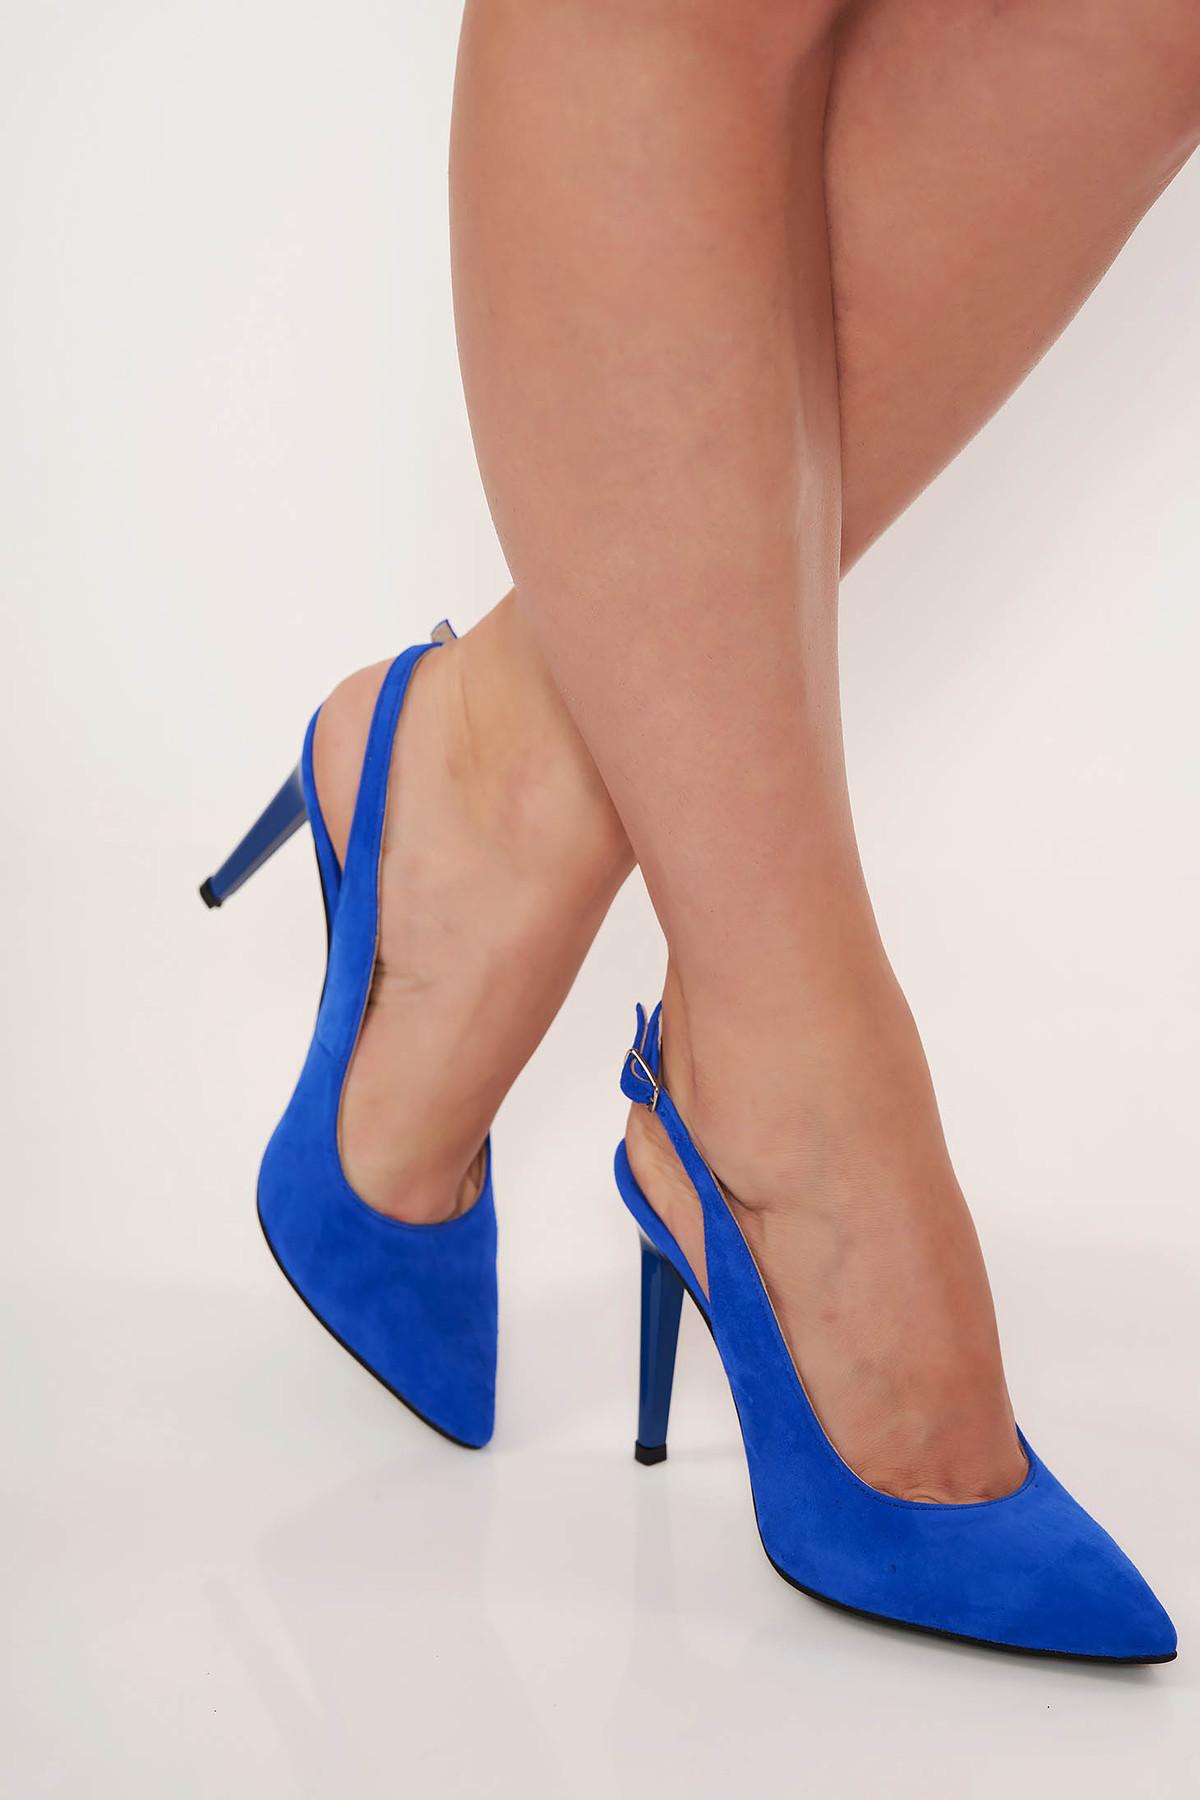 Sandale albastre elegante din piele naturala cu varful usor ascutit calcai decupat